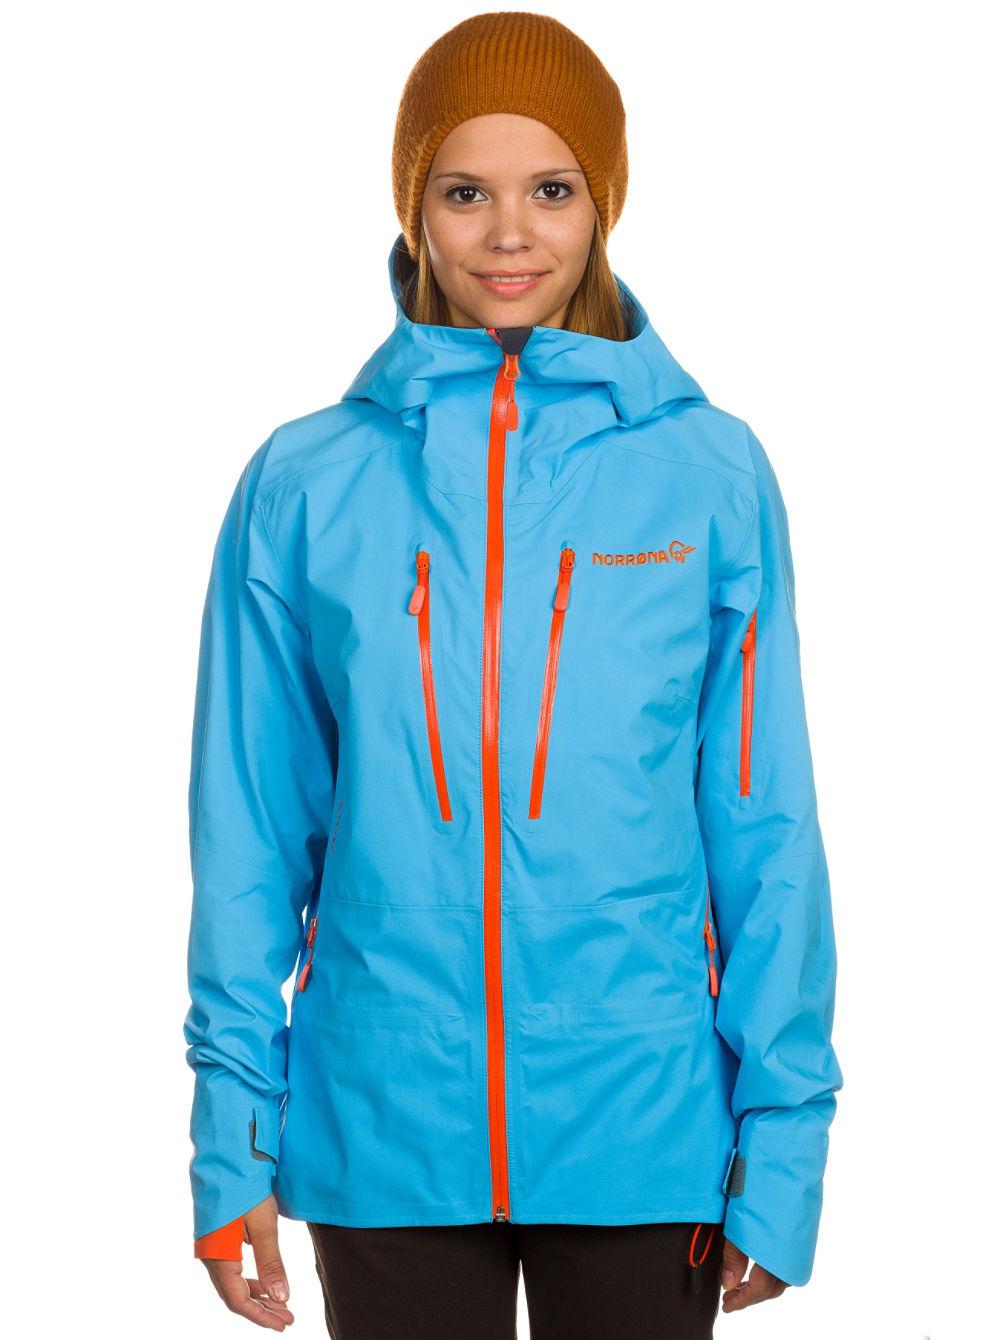 a2b3590f019 Buy Norrona Lofoten Gore-Tex Pro Jacket online at blue-tomato.com